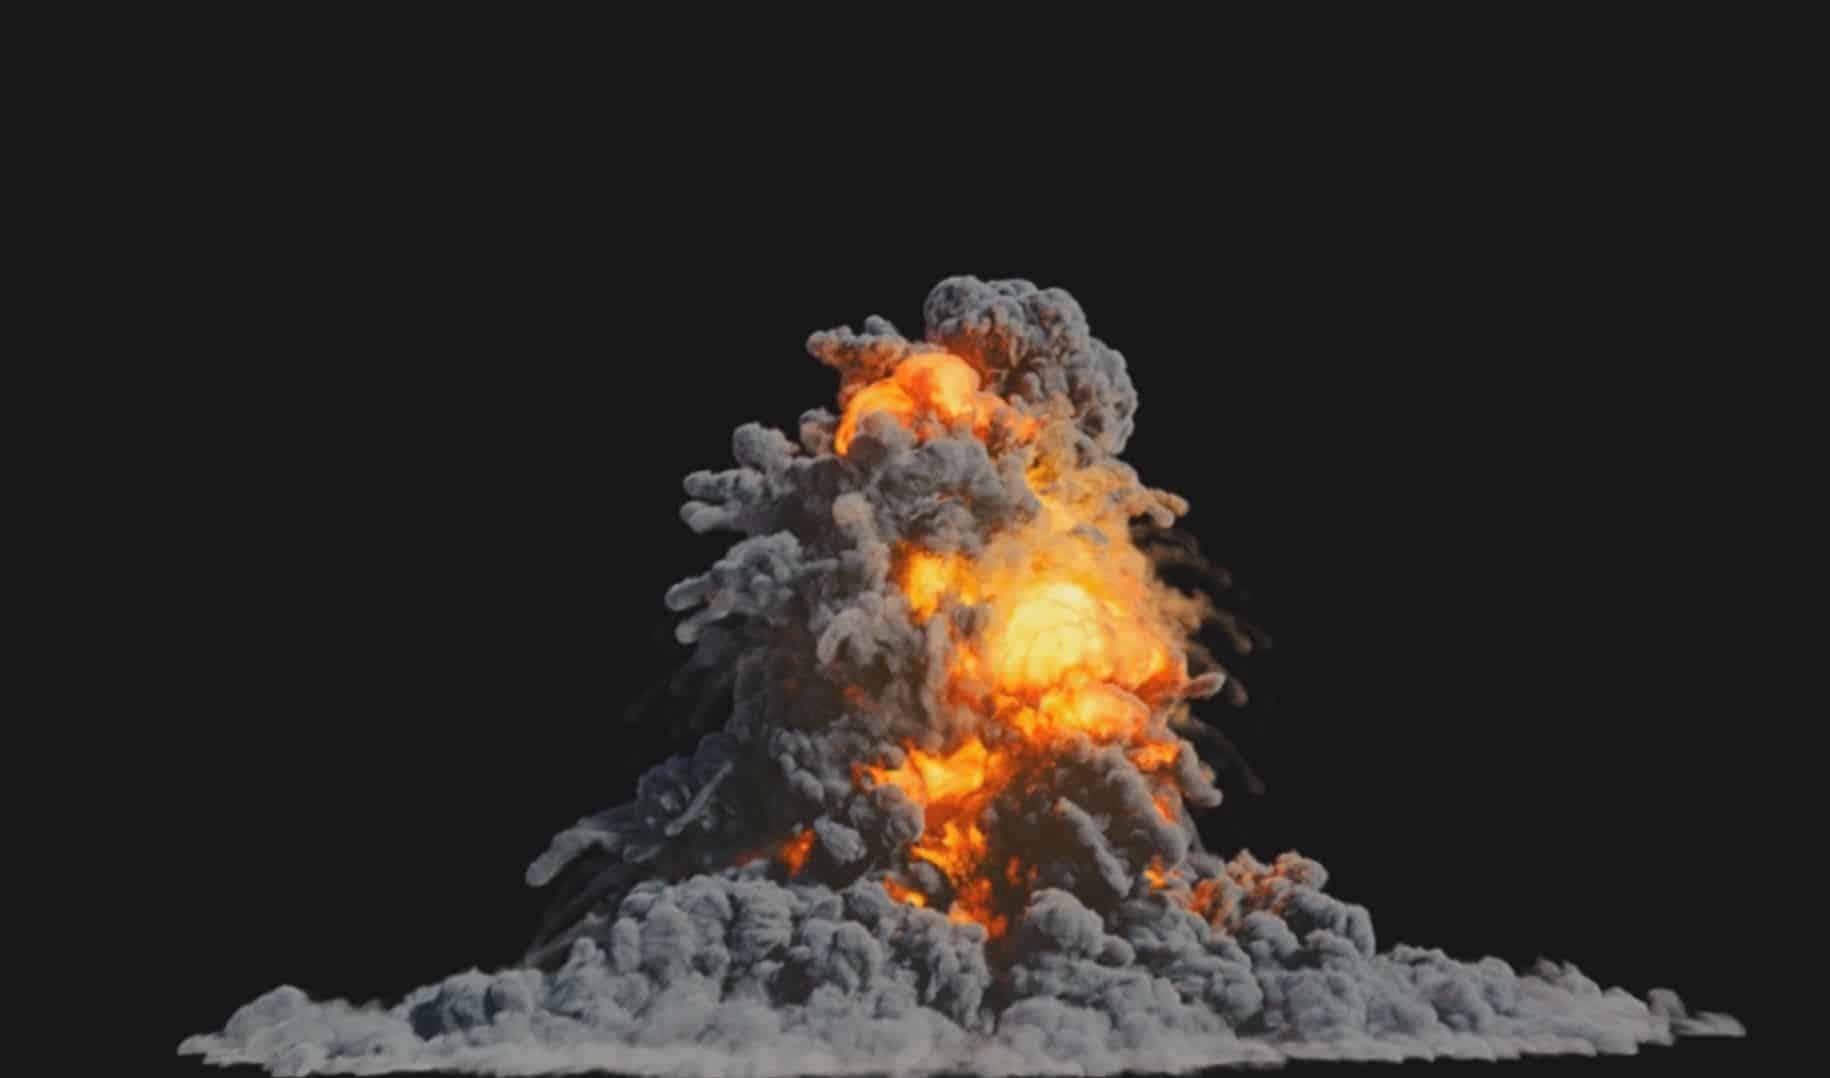 Houdini explosion megapack - 4 Explosions